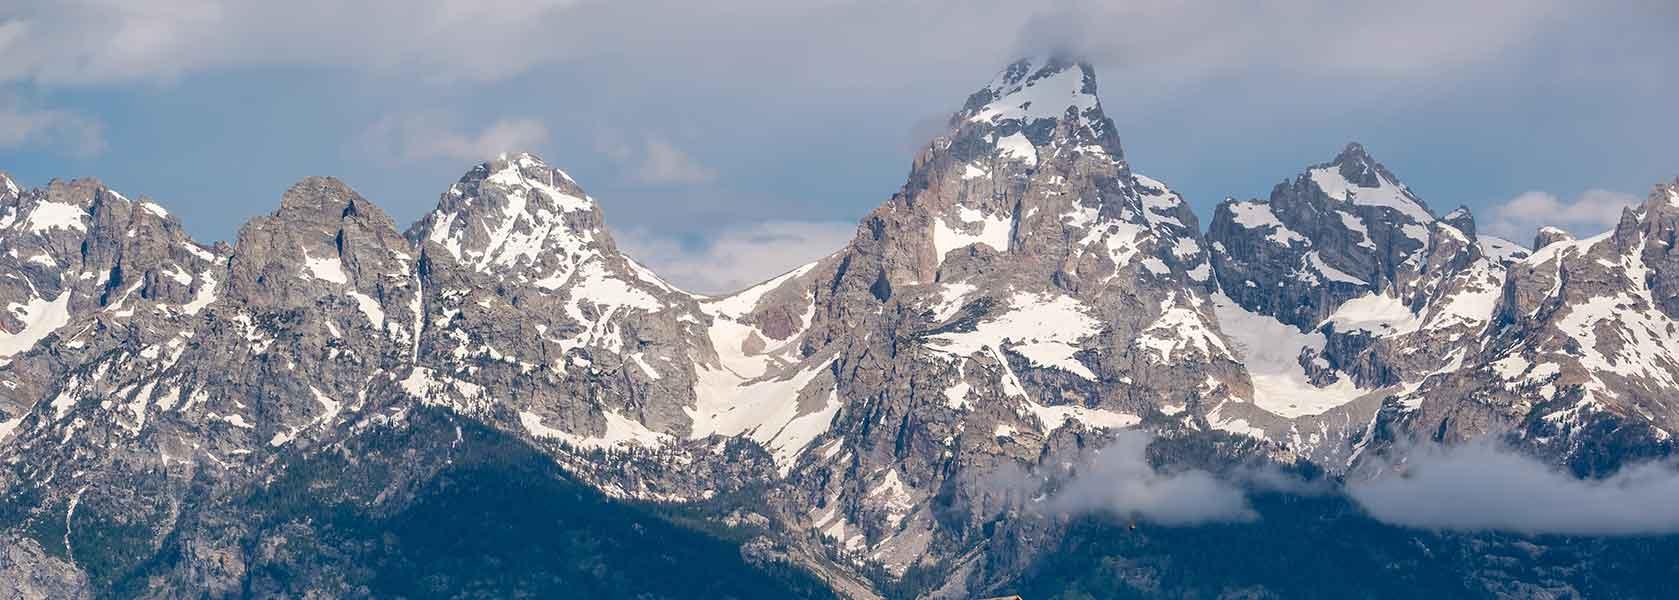 Scenic Flight over the Tetons